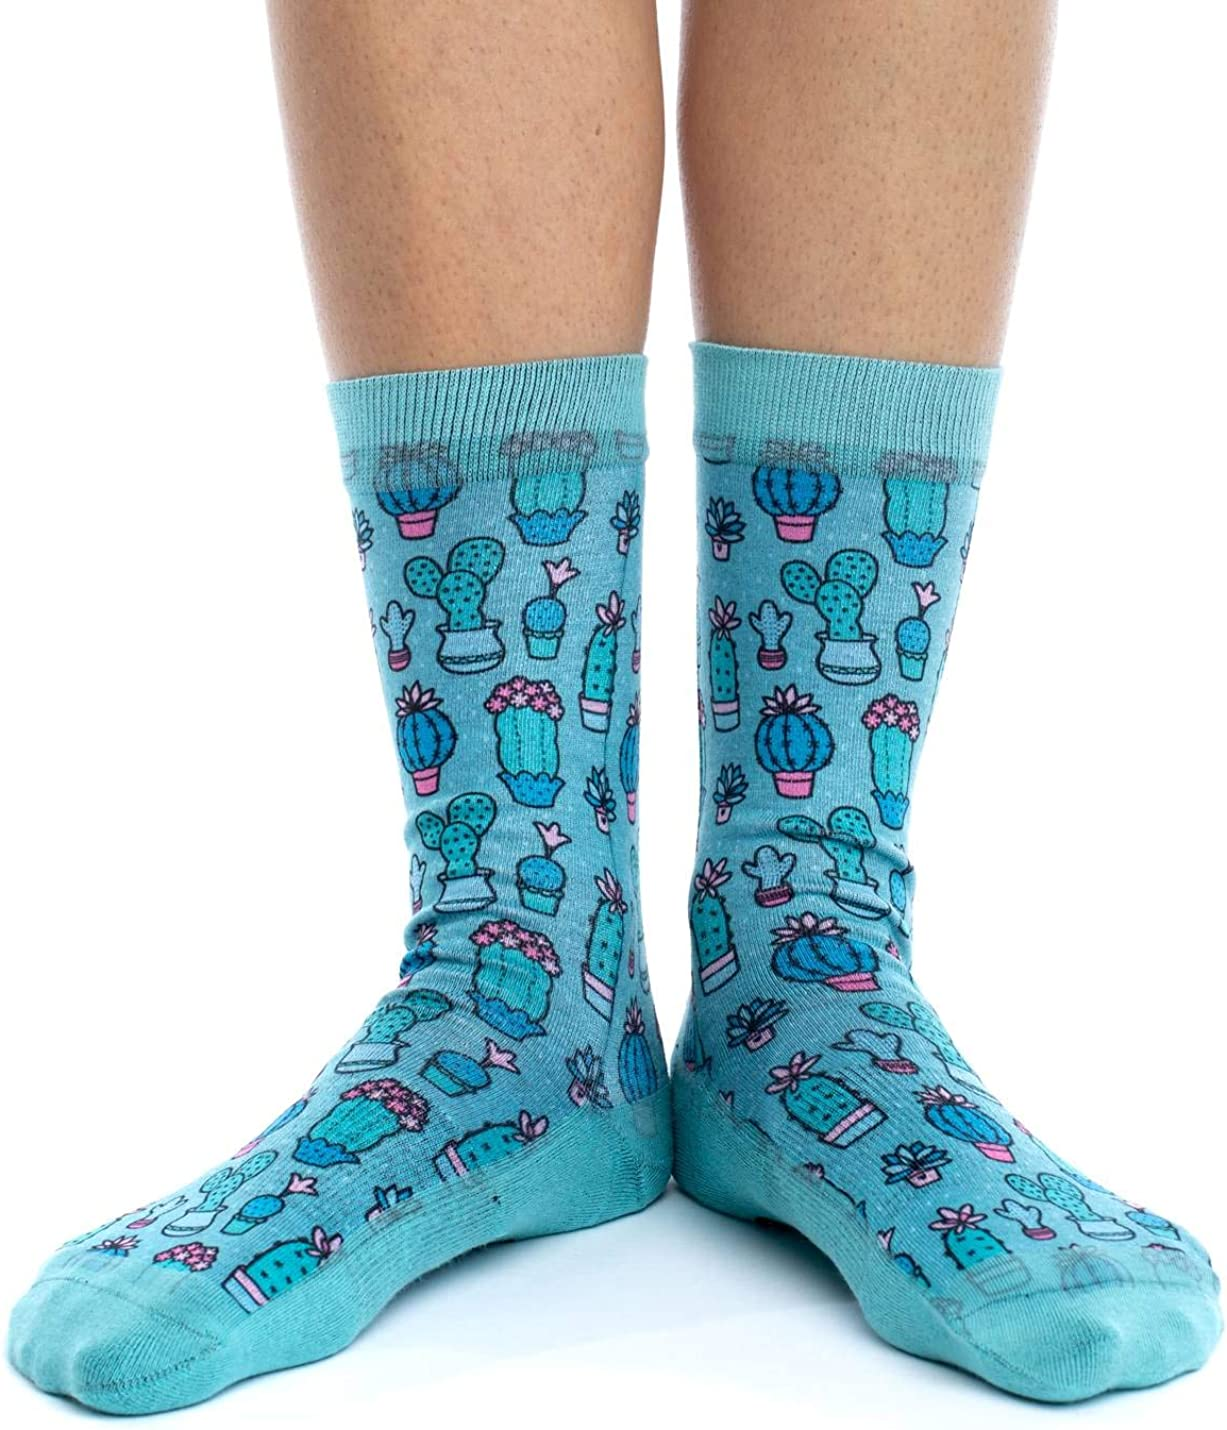 Mens athletic low cut Ankle sock Cactus Flower Short Fit Sock